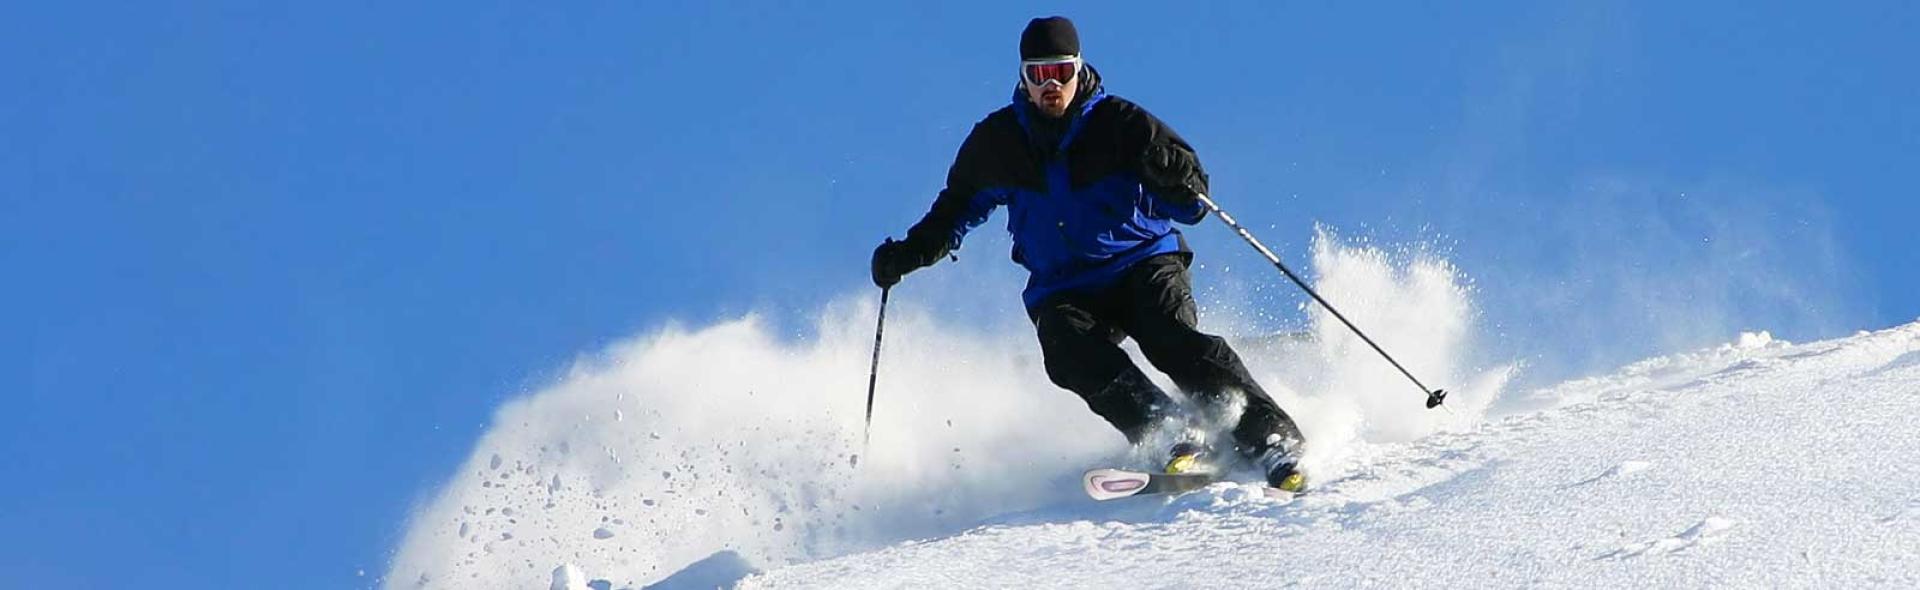 Wingate-ski